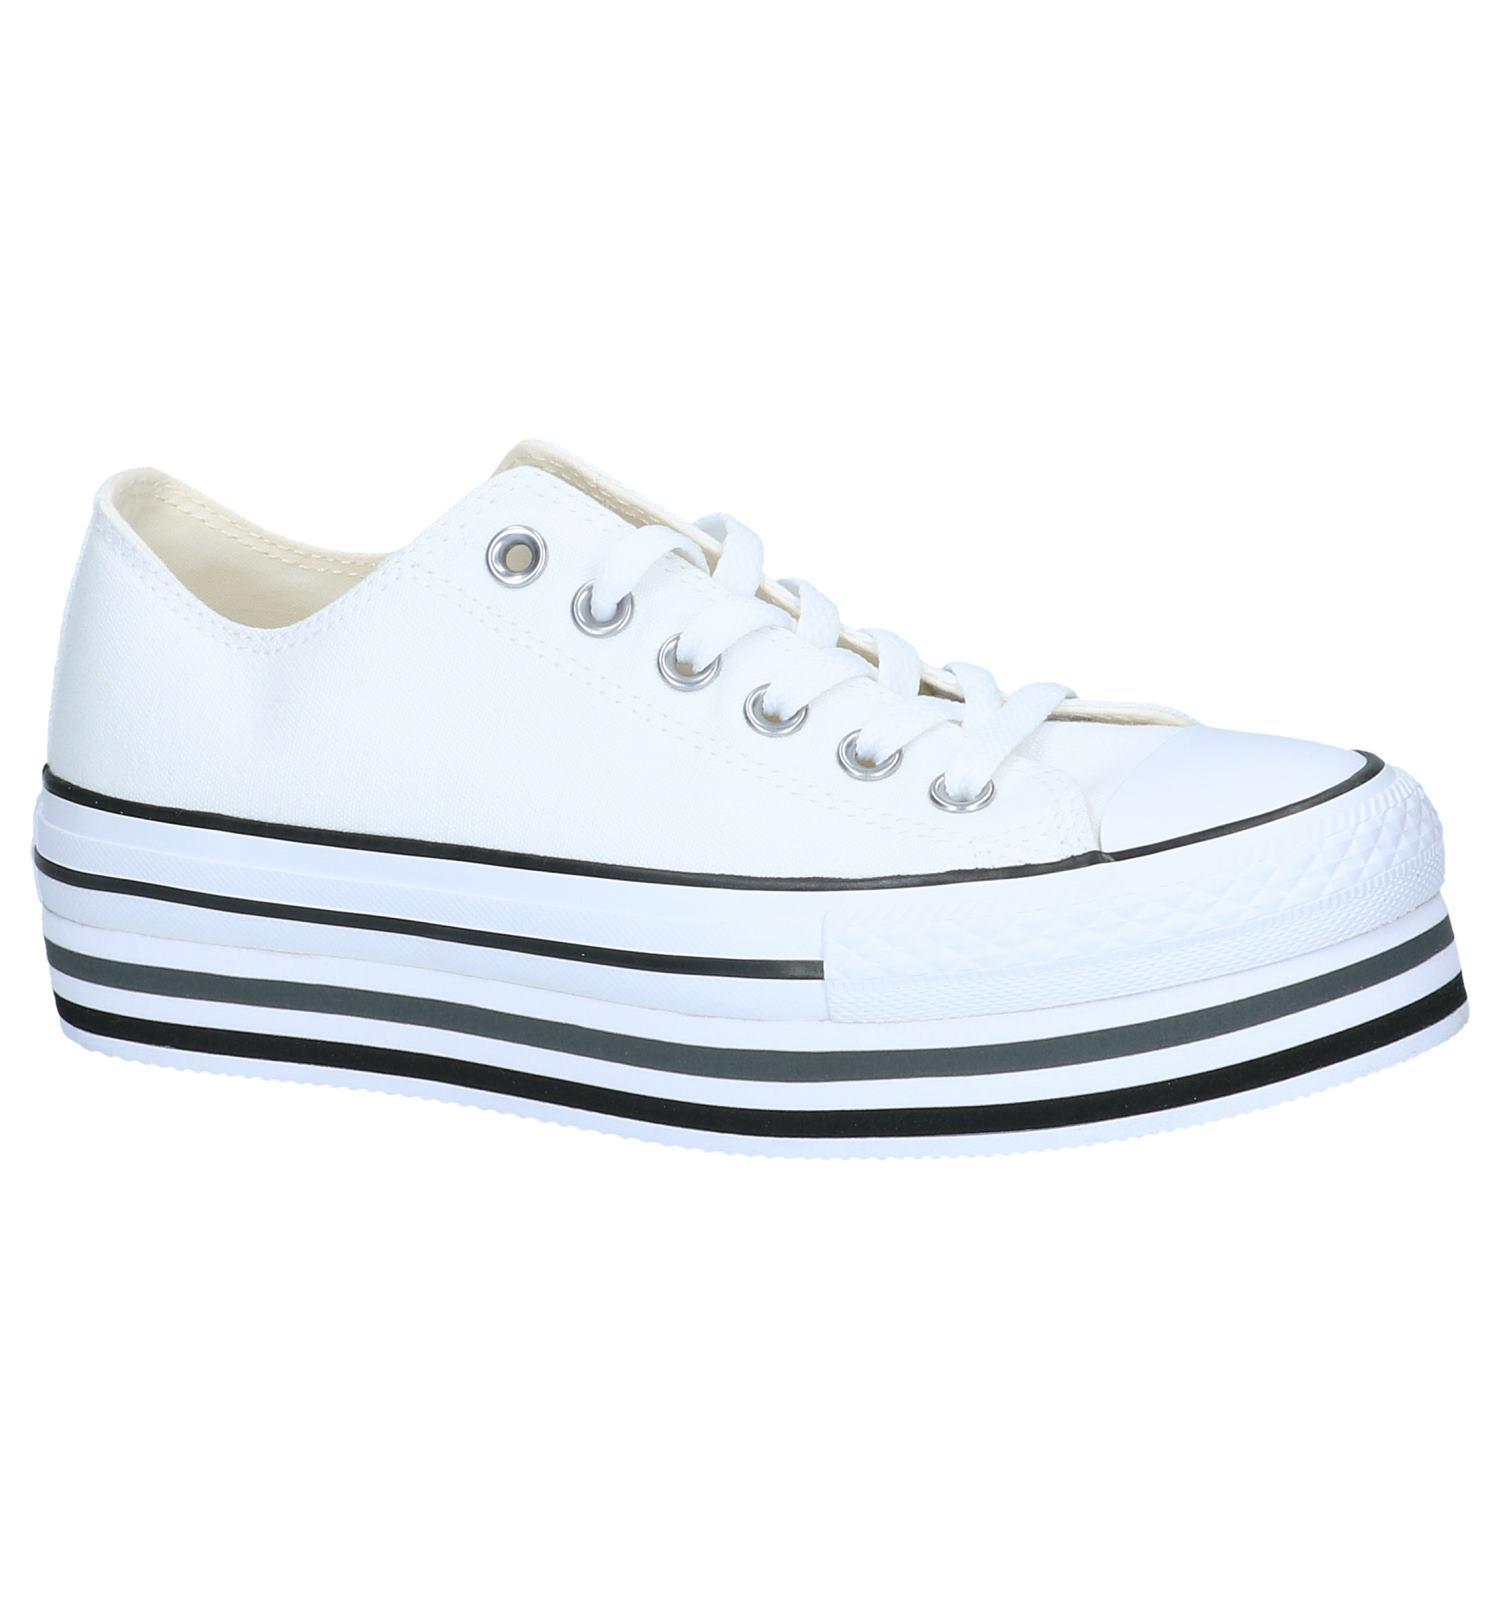 63c5fc72e72 Witte Sneakers Converse All Star Chuck Taylor Platform Layer   TORFS.BE    Gratis verzend en retour